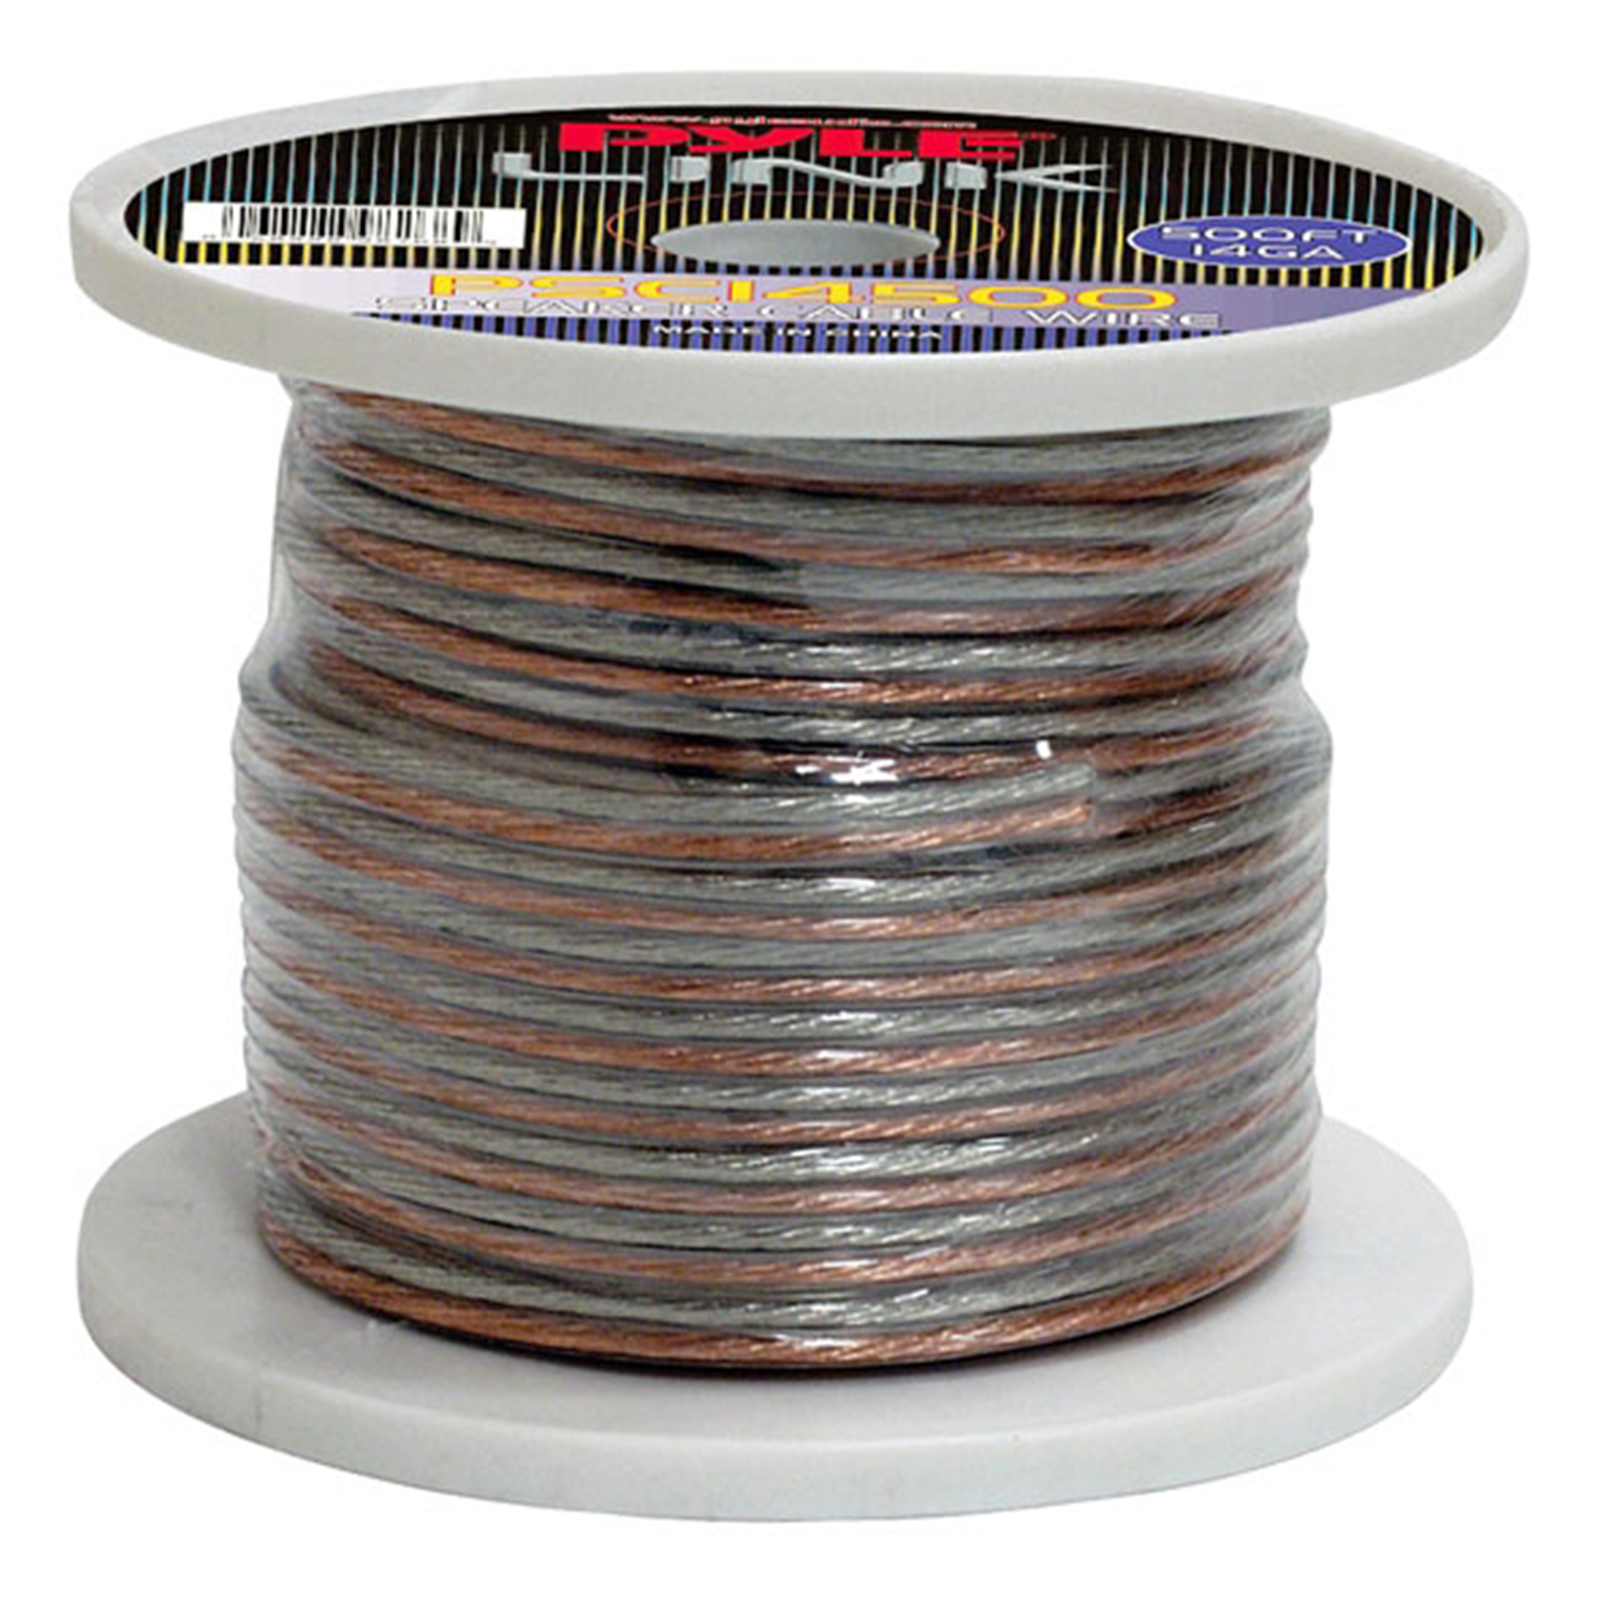 14 Gauge 500 ft. Spool of High Quality Speaker Zip Wire